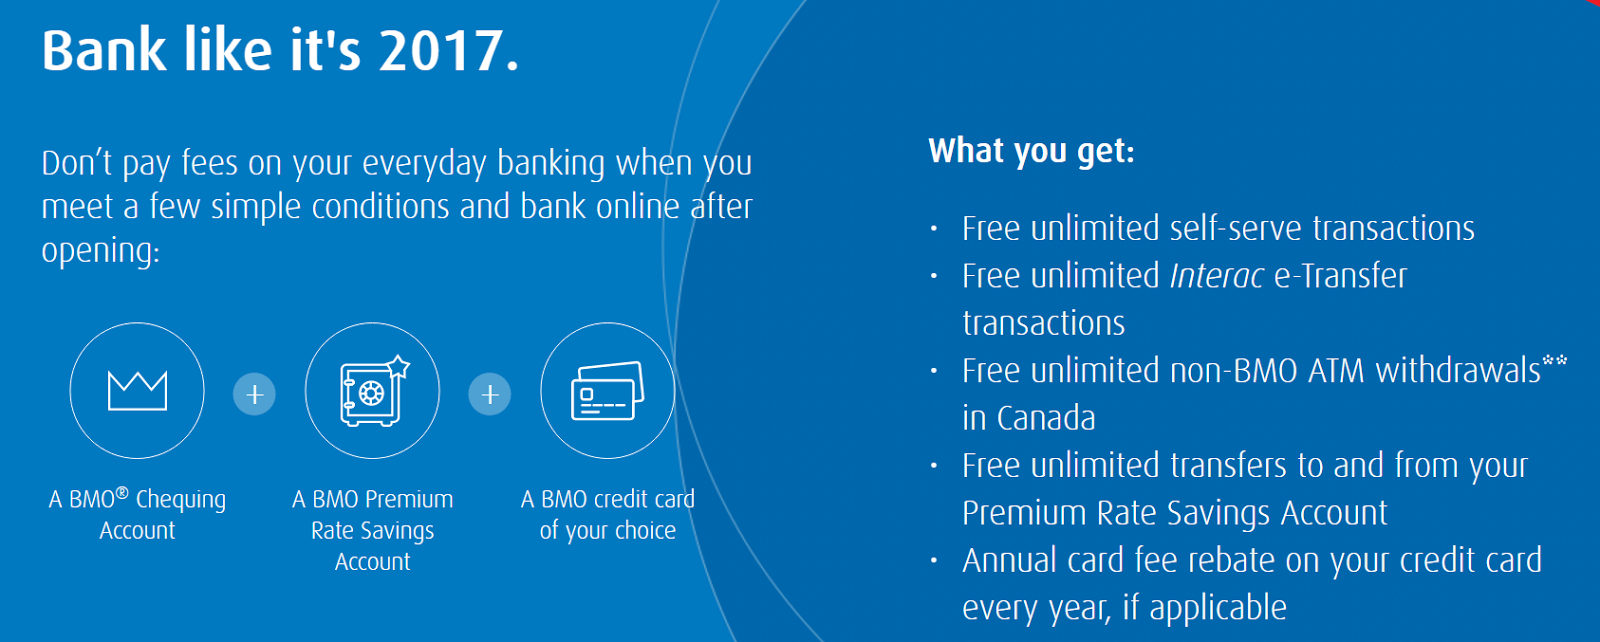 On cash loan ocbc nisp photo 8